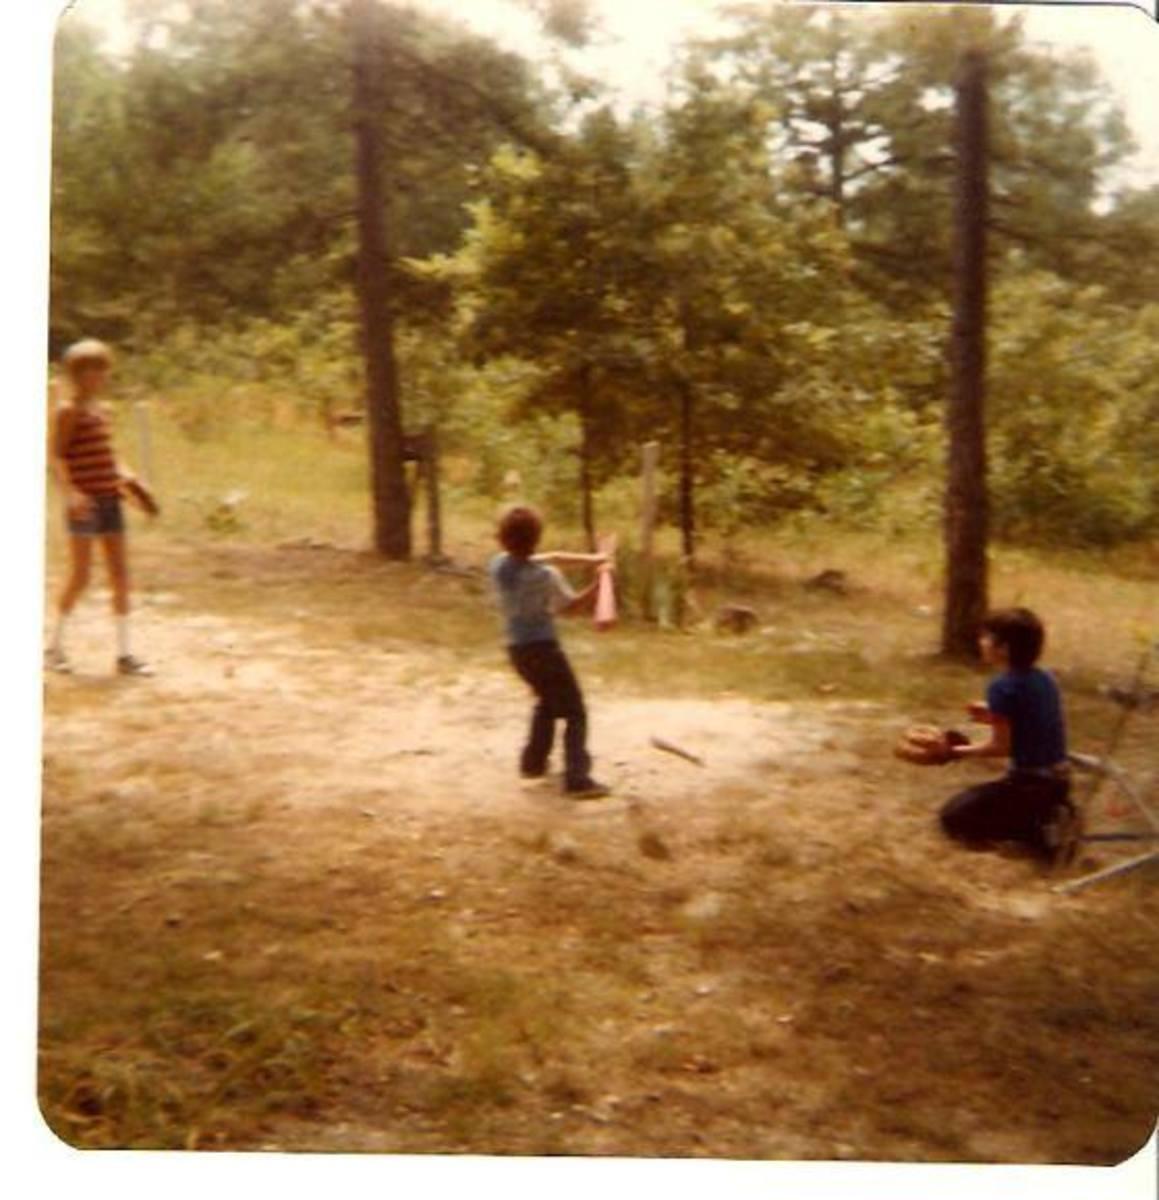 1978: Hodges baseball team